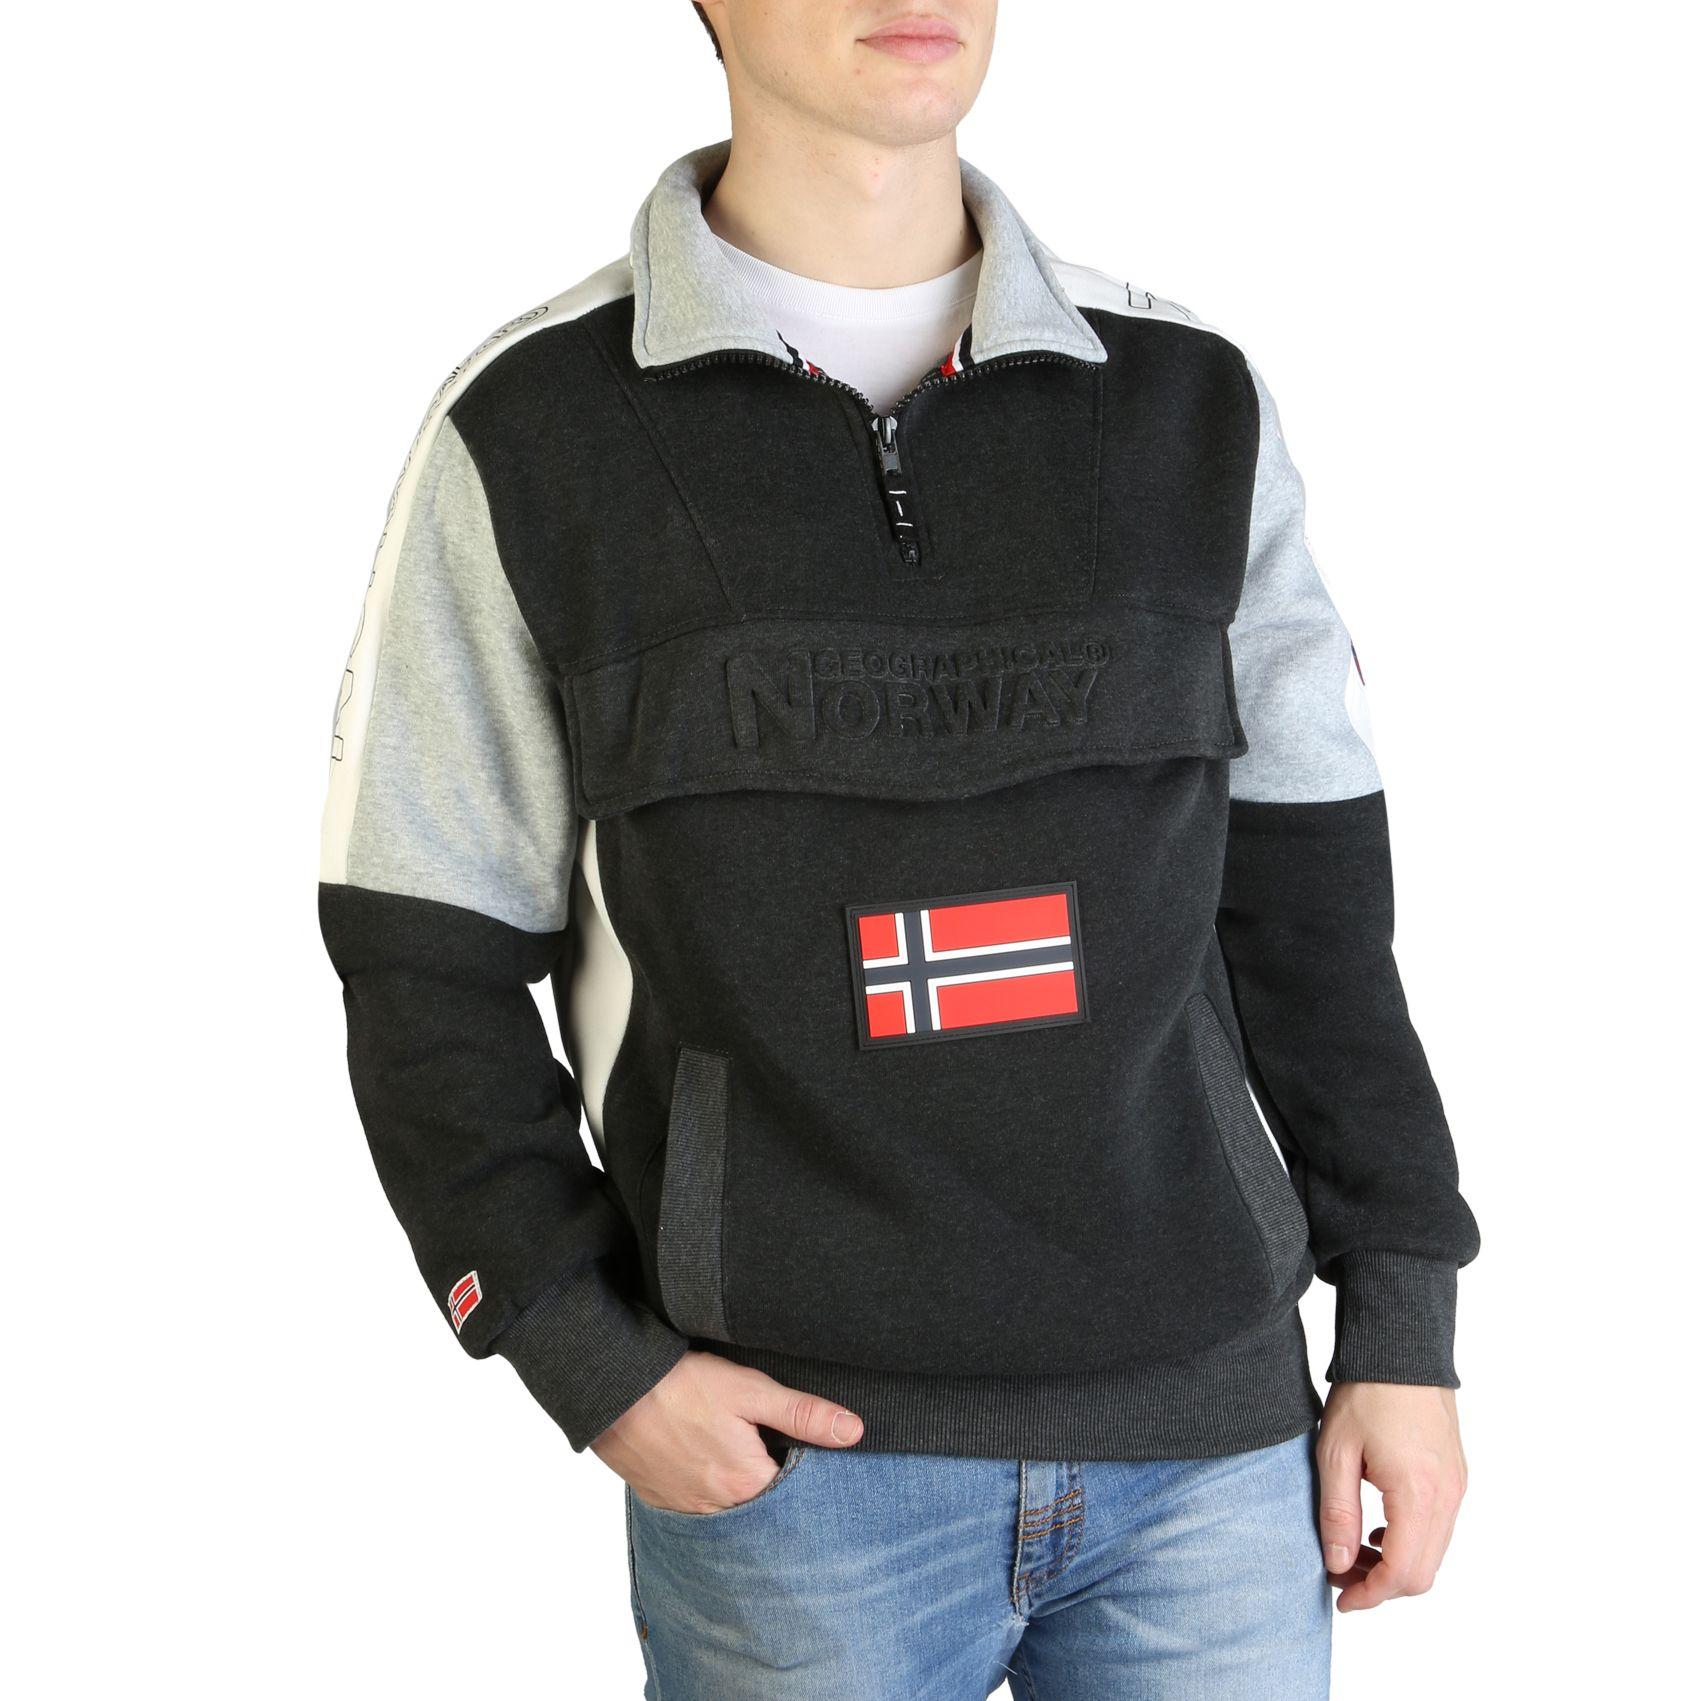 Geographical Norway – Fagostino007_man – Grijs Designeritems.nl